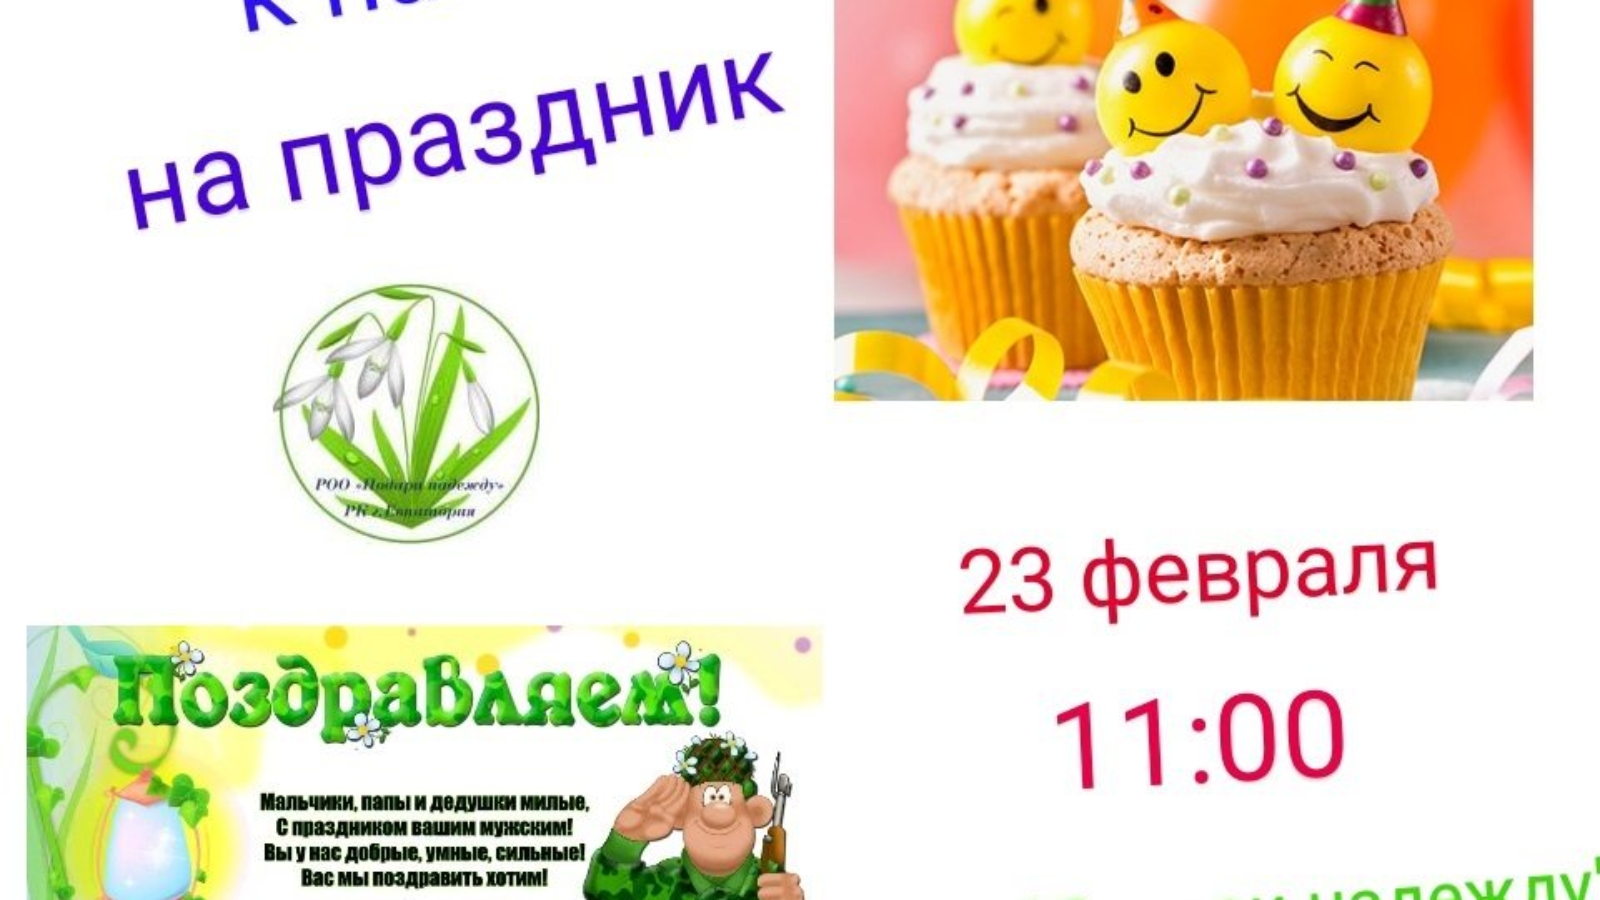 IMG_20190502_212231_41